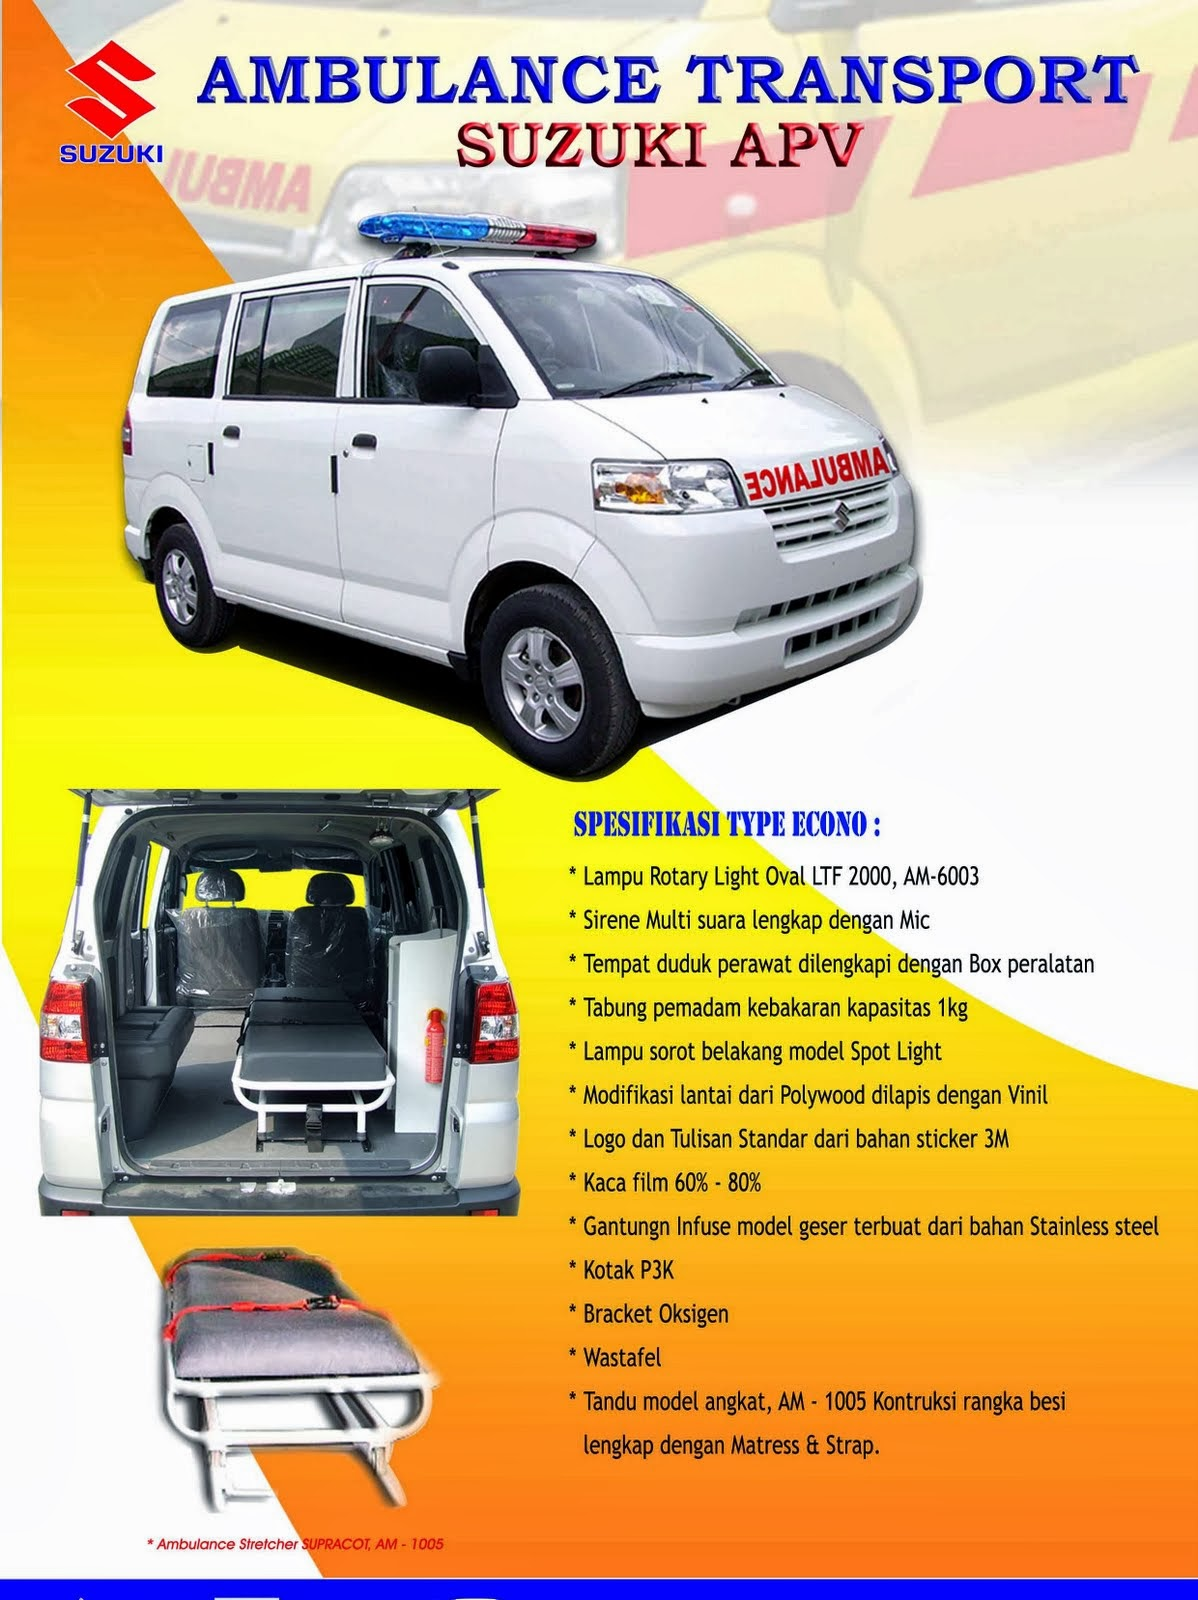 APV Ambulance Spesifikasi Economi 2014